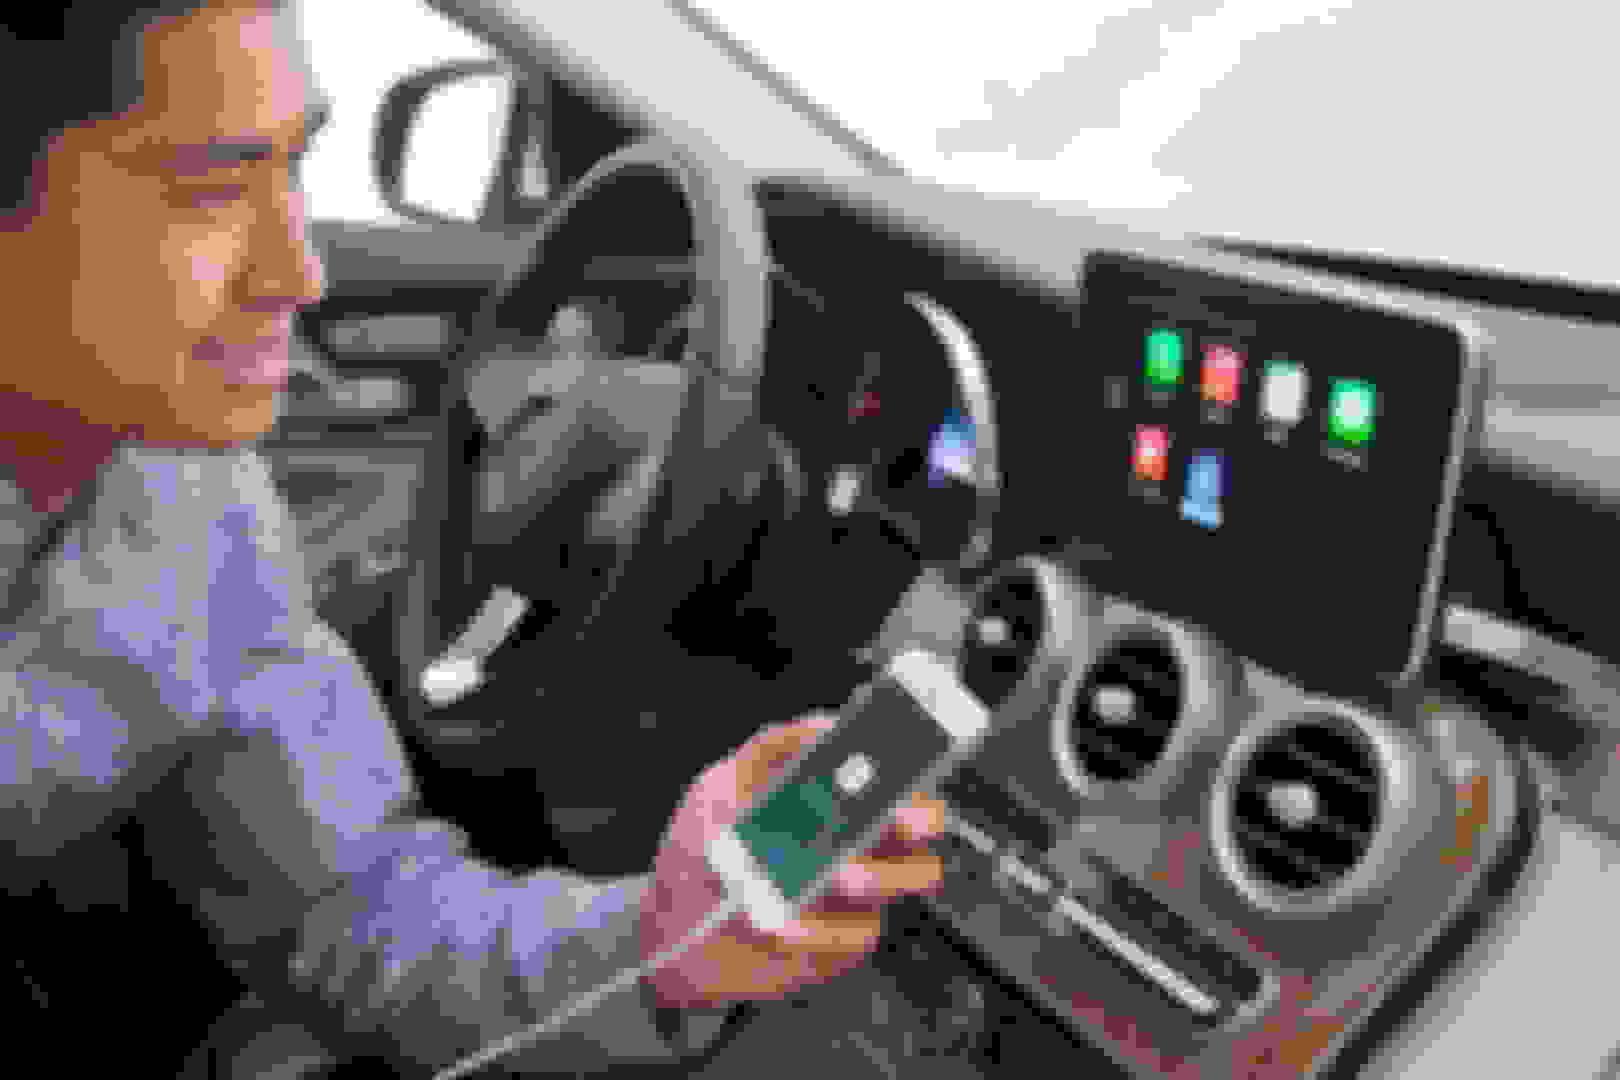 Retrofit CarPlay in W205 - Page 4 - MBWorld org Forums